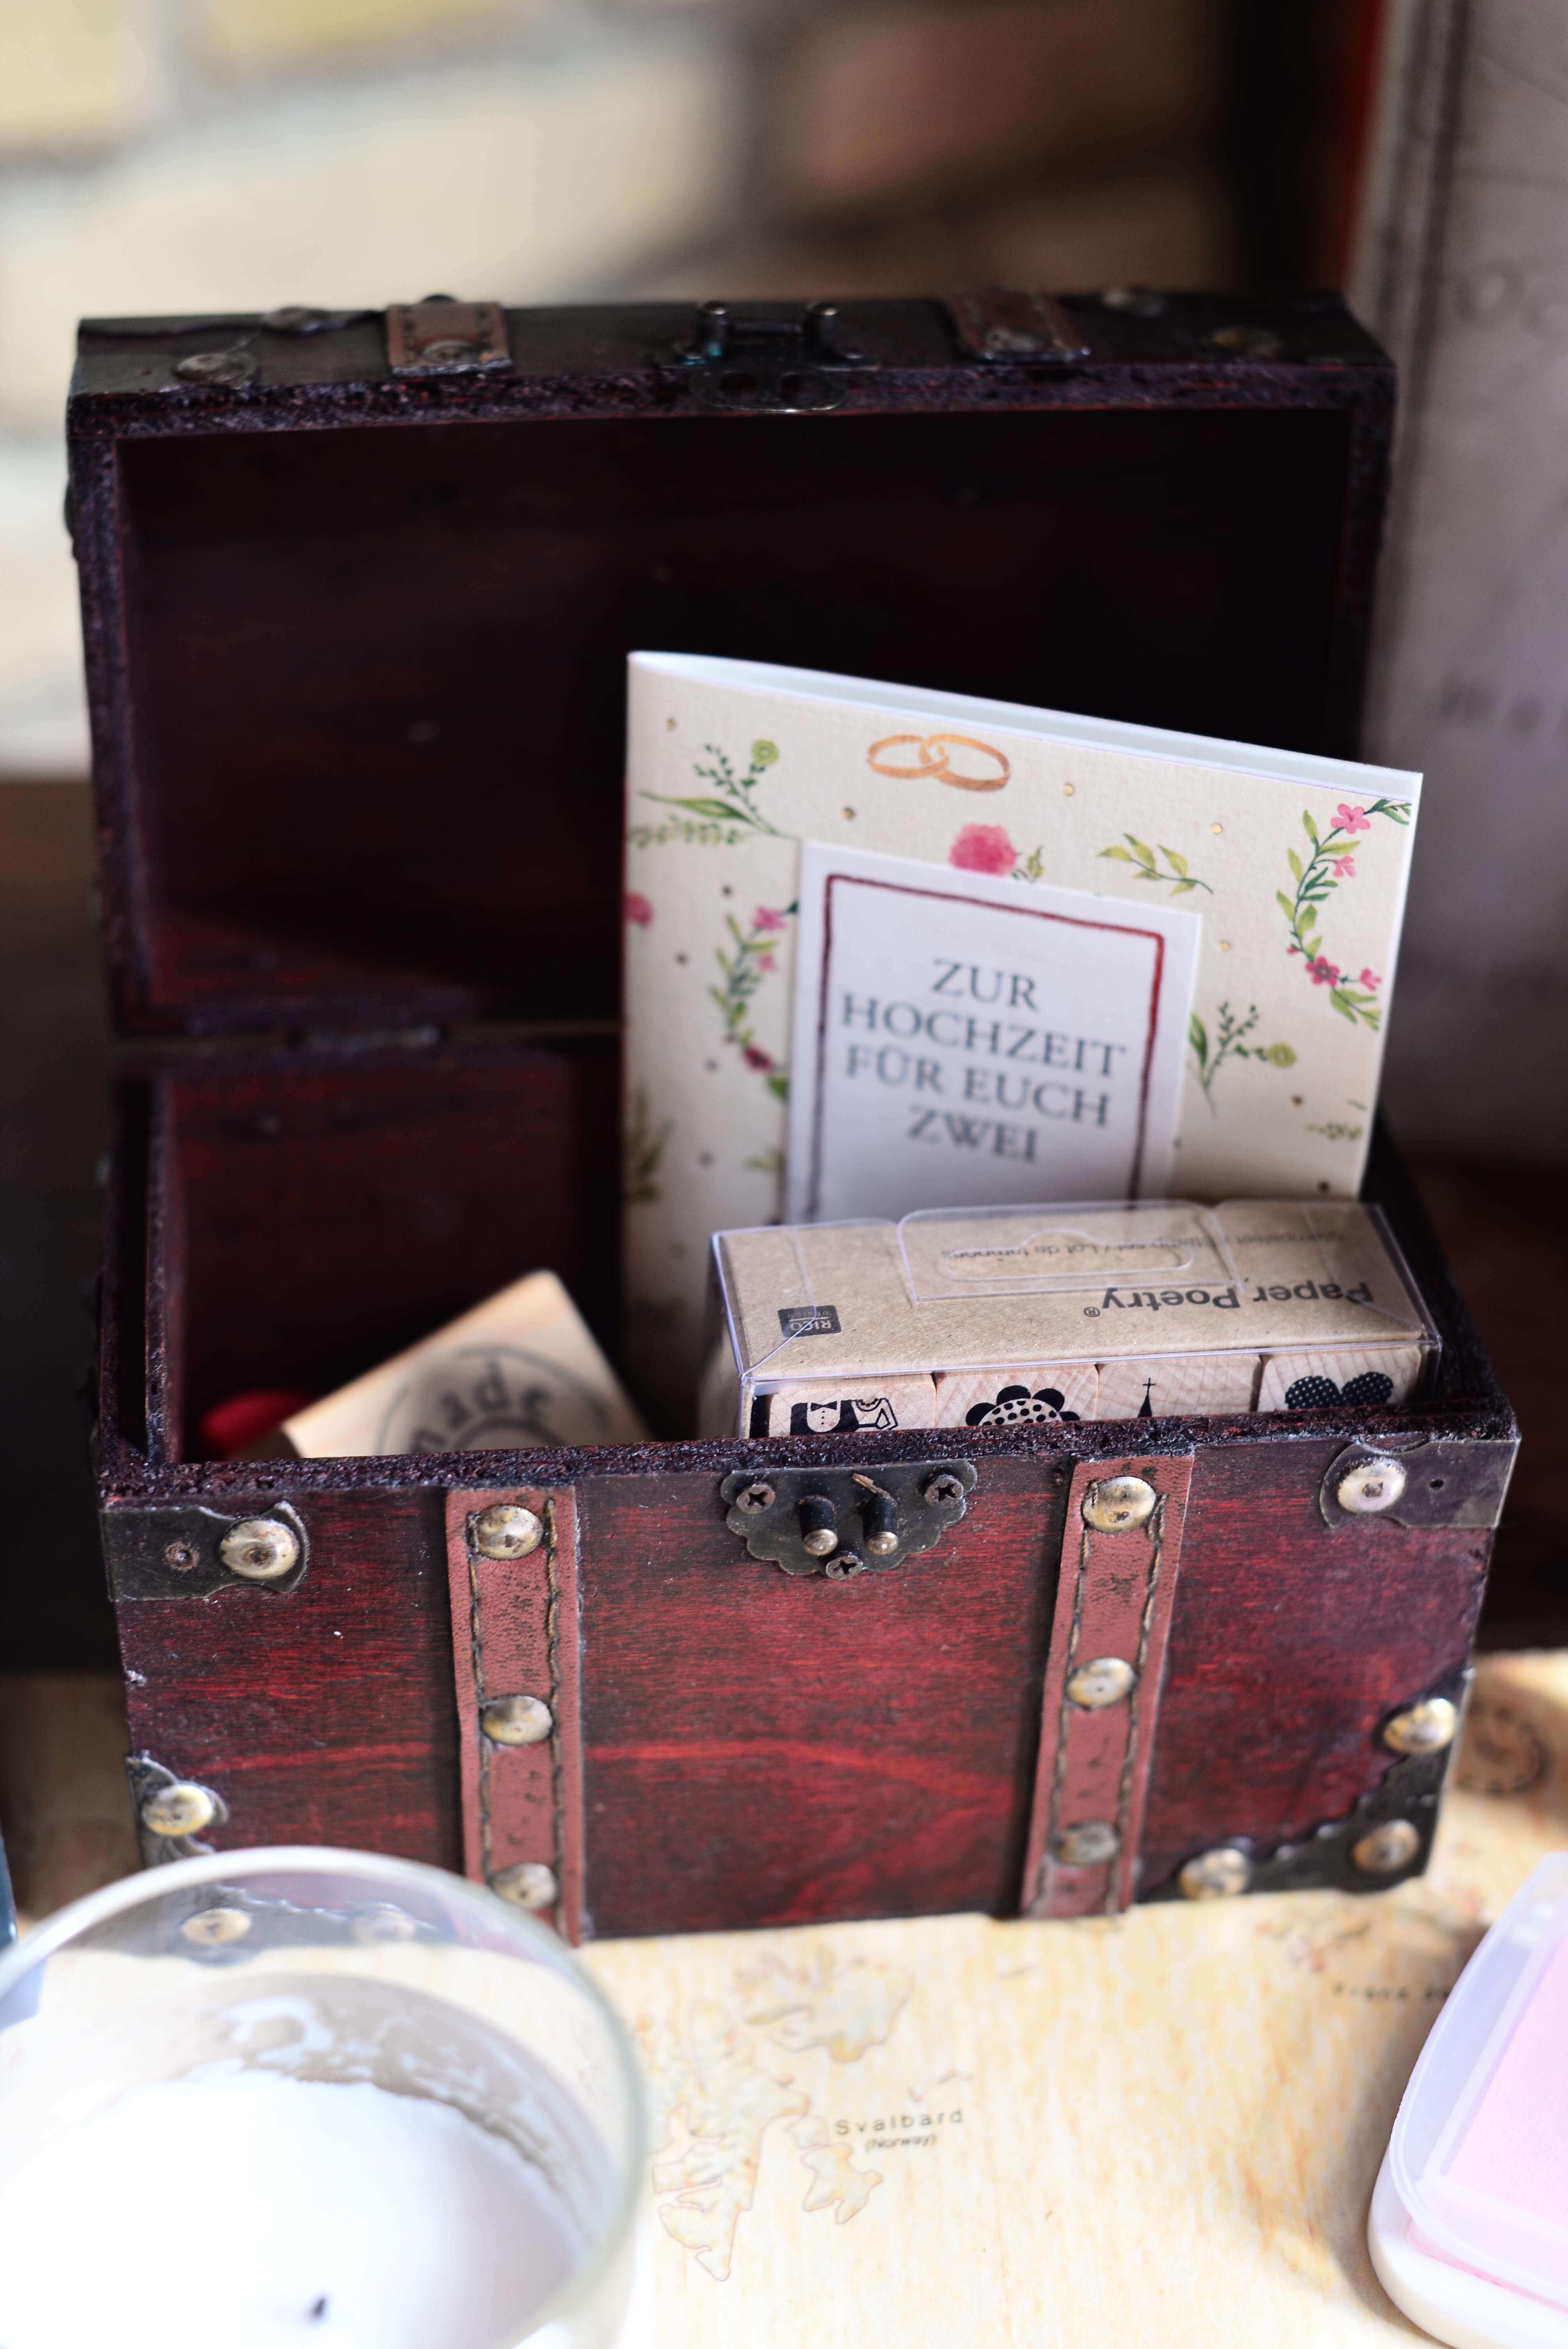 Vintage-KofferIMB2een1PCP4n